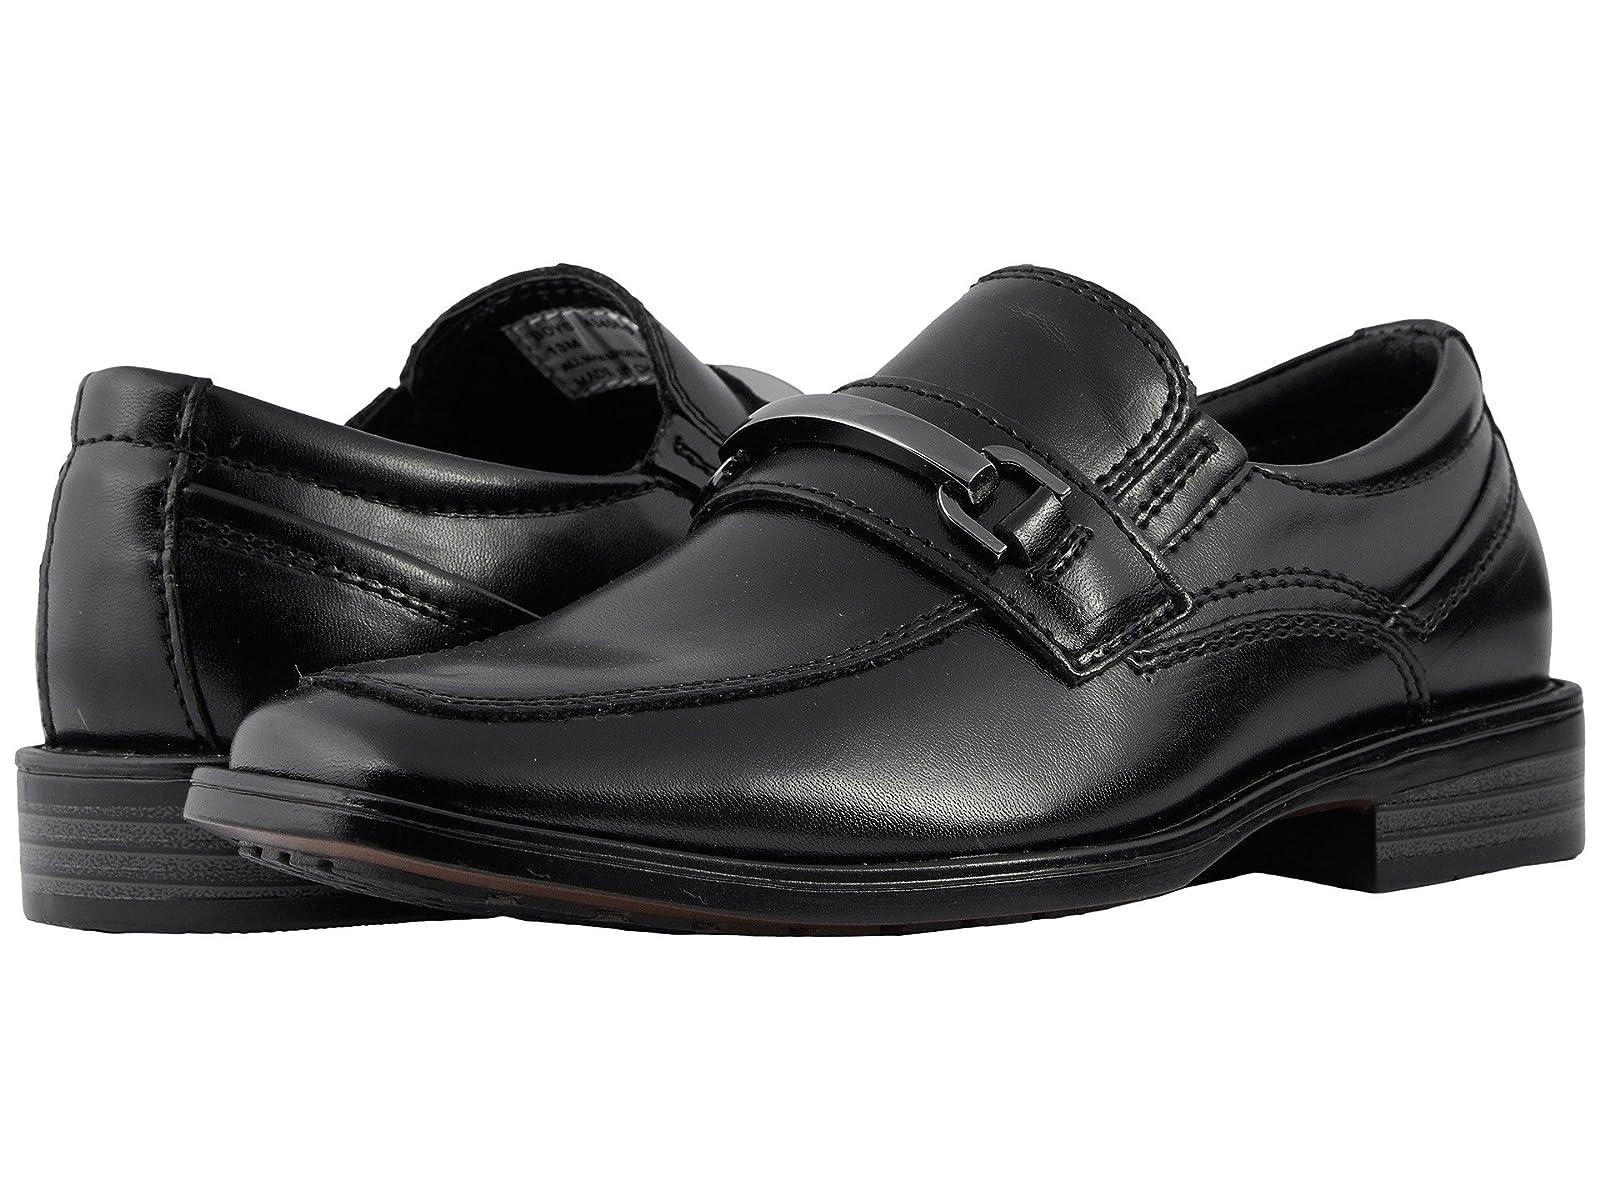 Stacy Adams Kids Carver (Little Kid/Big Kid)Atmospheric grades have affordable shoes